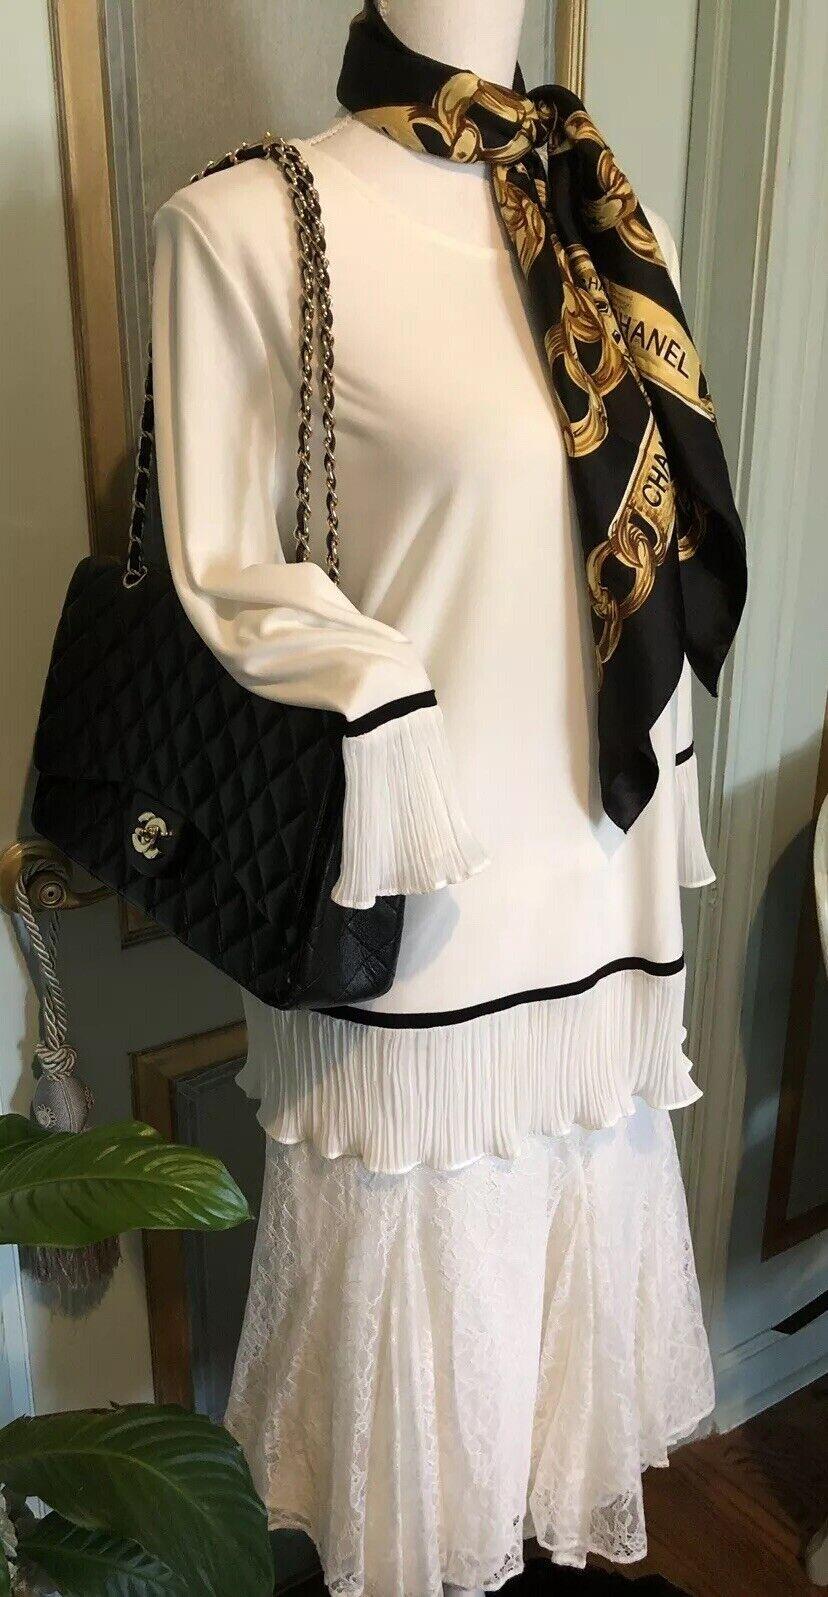 NWT Ralph Lauren Cream Lace Skirt Größe 14  198